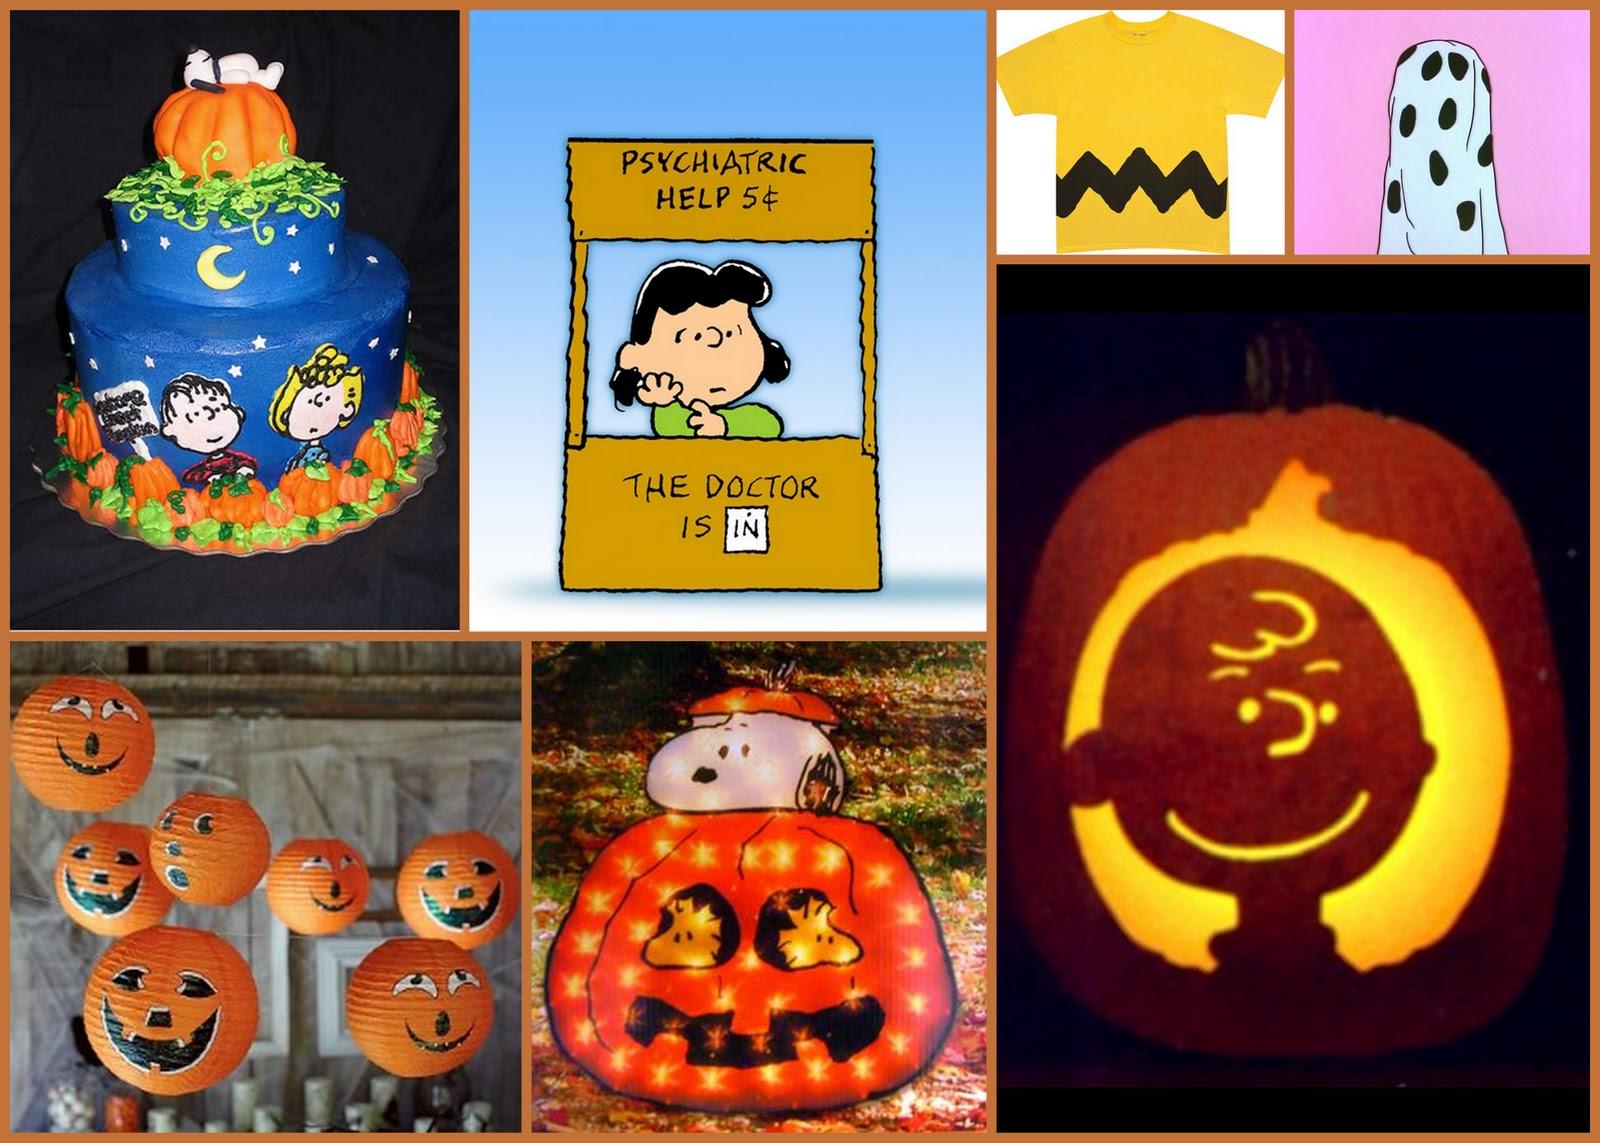 rebecca blogs: 24 october